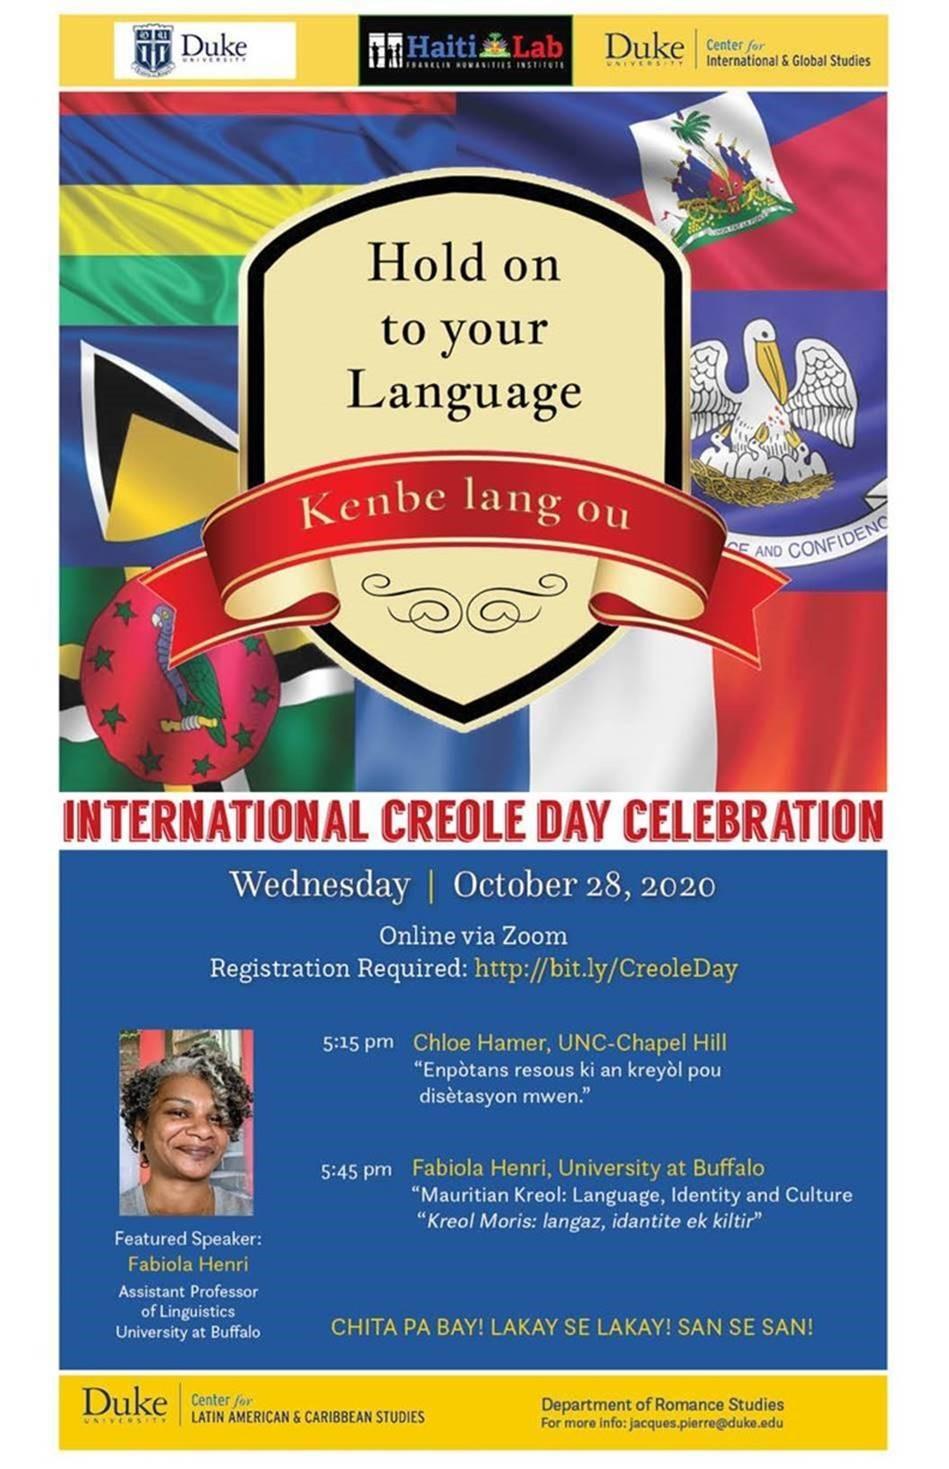 International Creole Day Celebration with Chloe Hamer